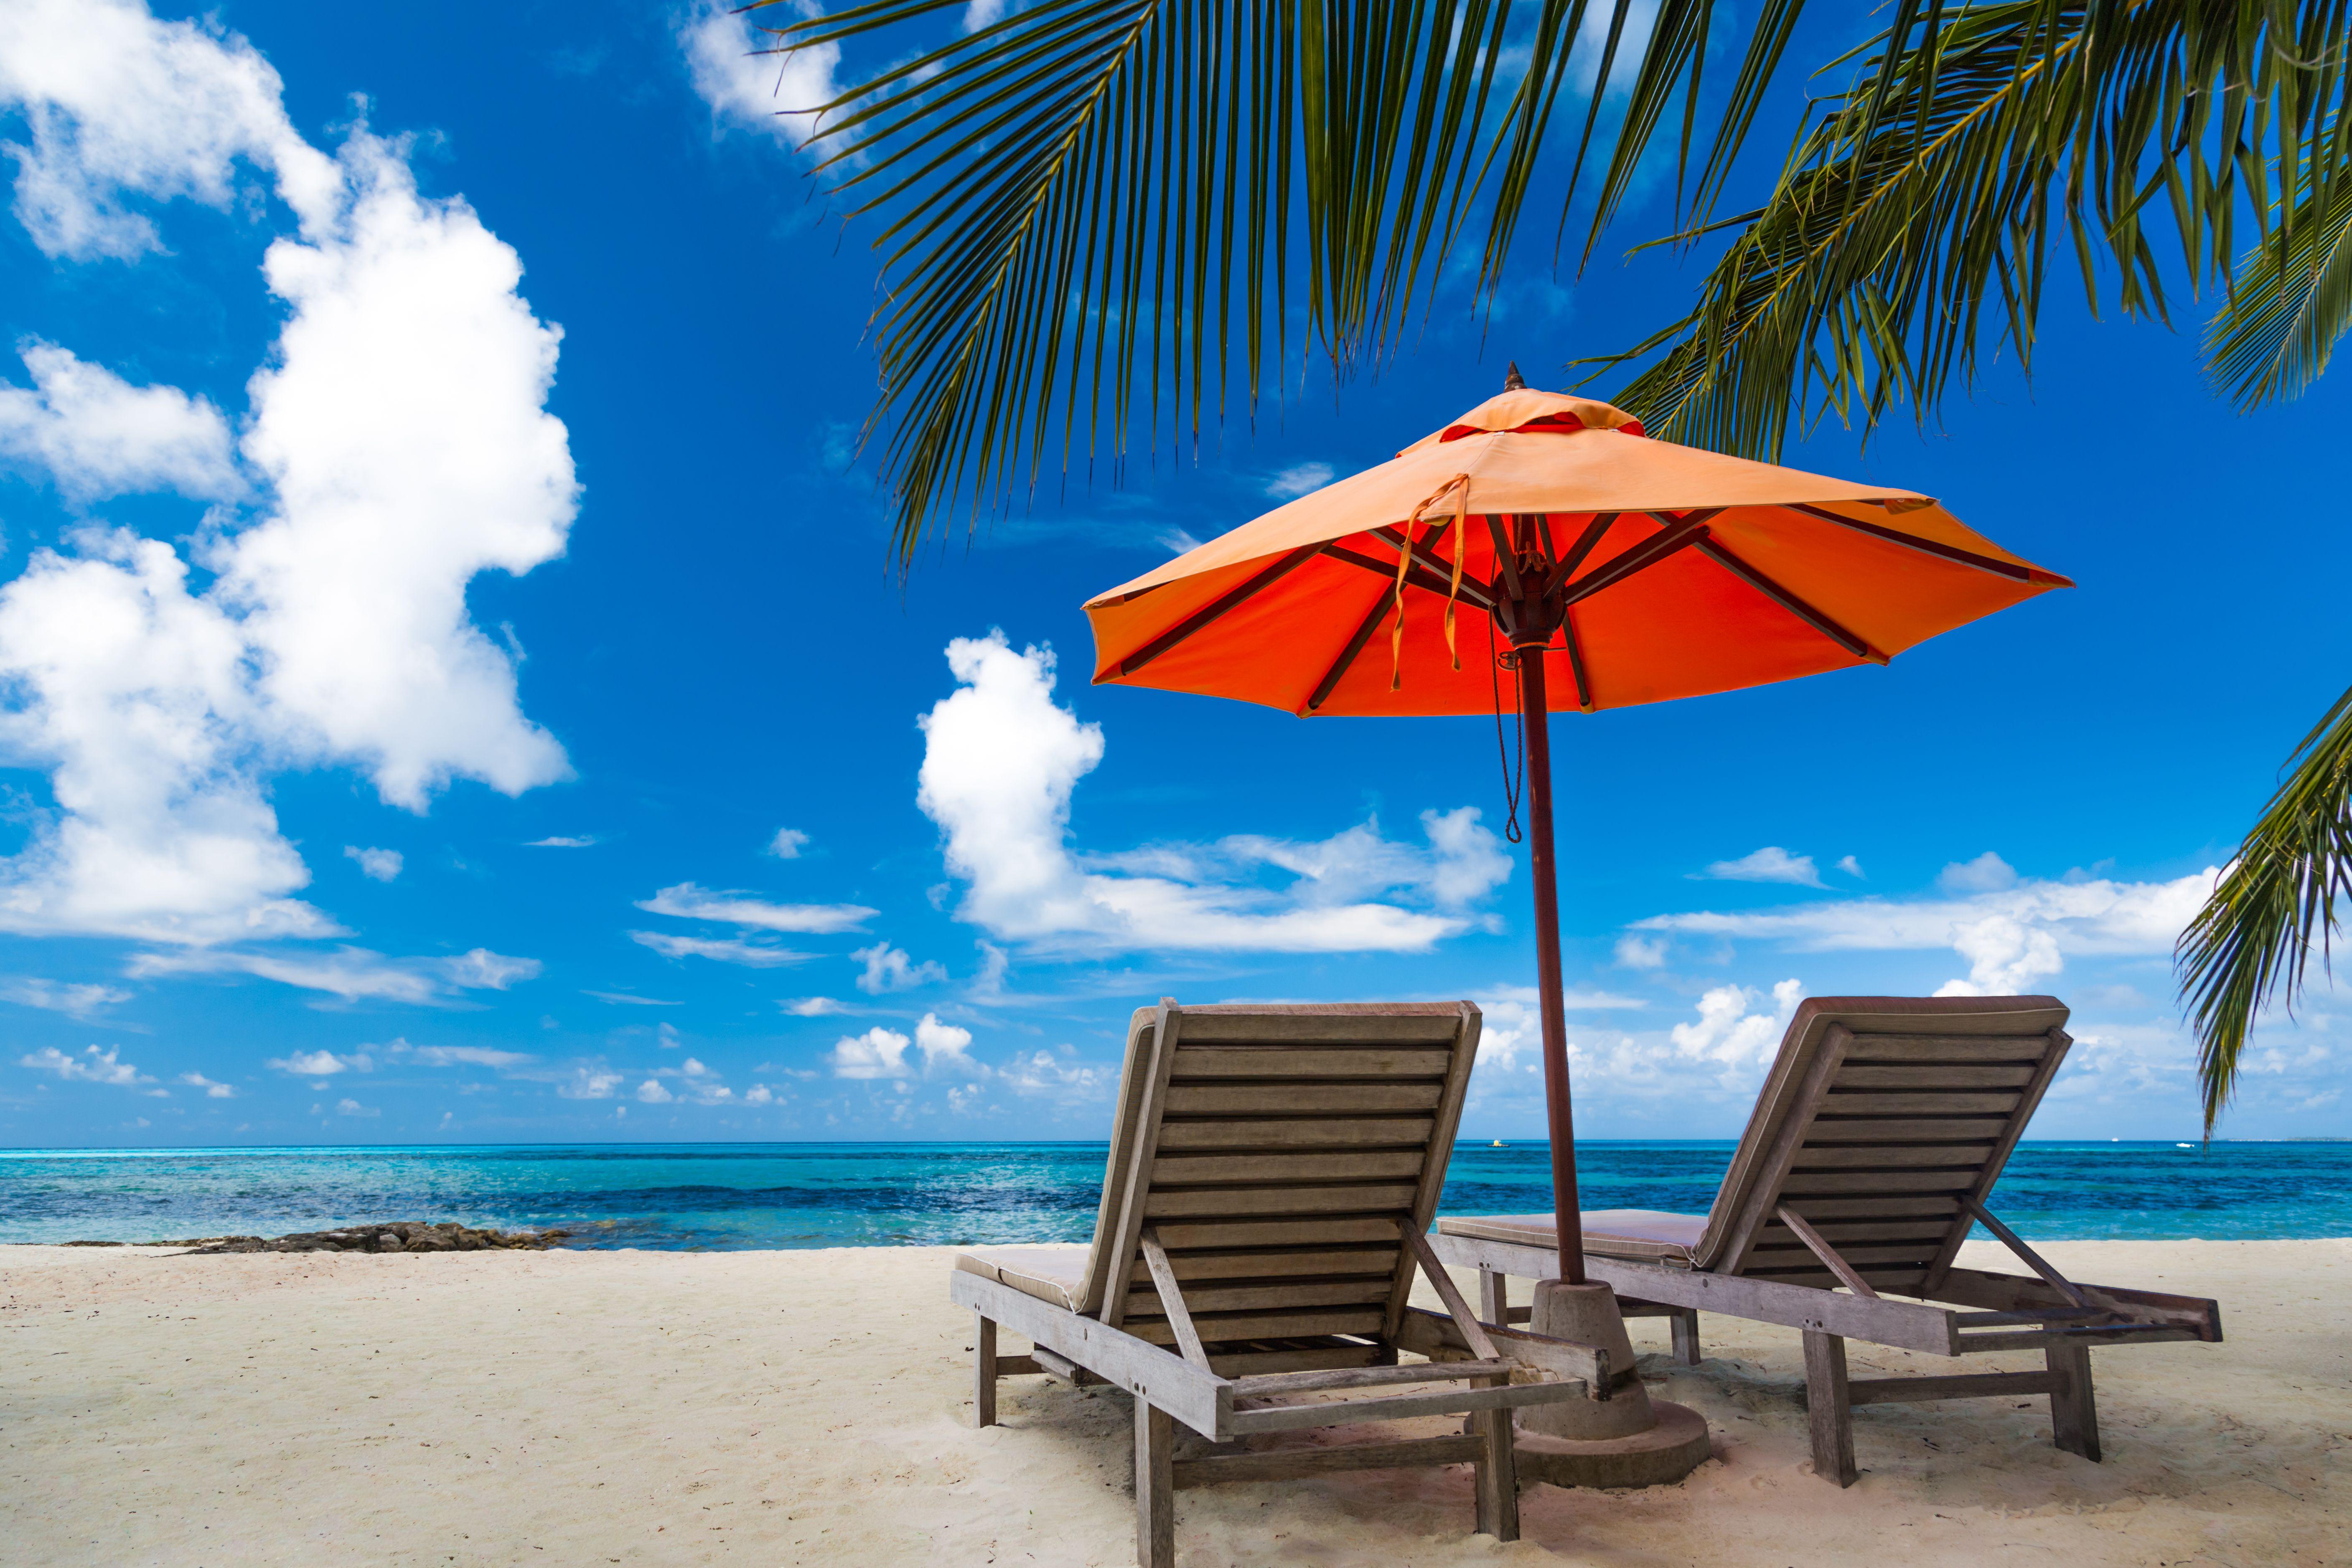 Sunbathing on the Beach